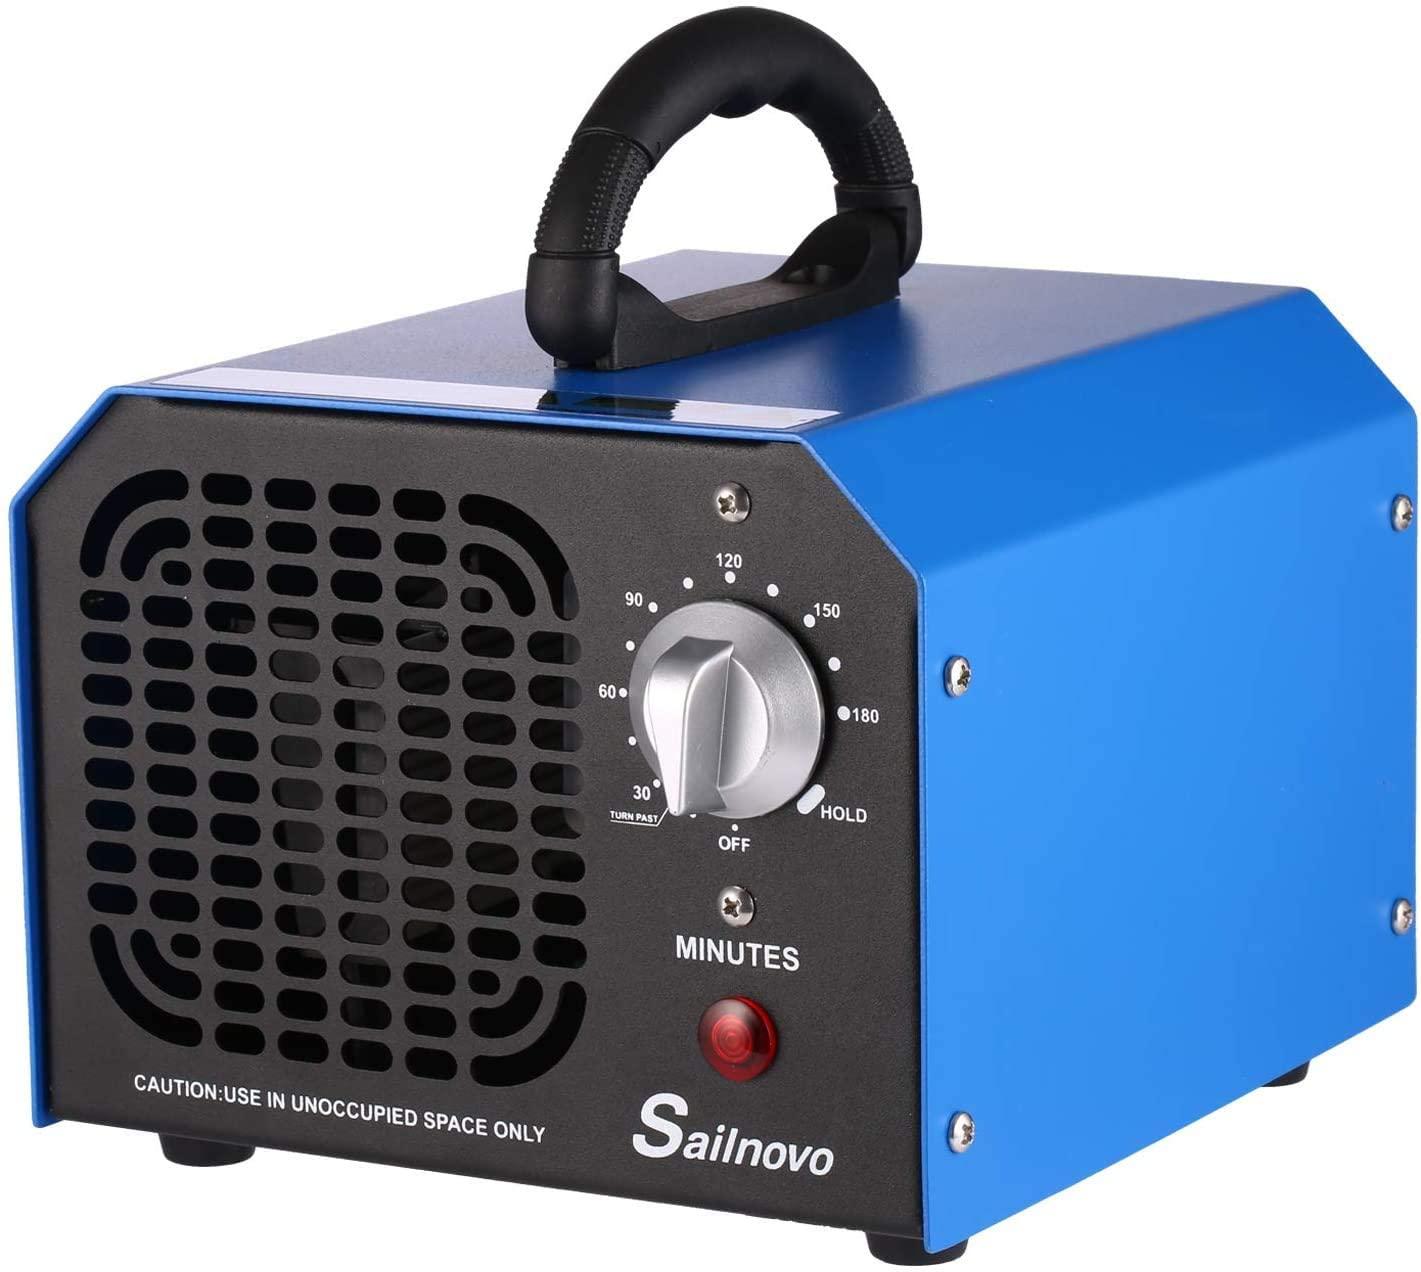 Sailnovo Ozone Generator Ozone Machine for Rooms Car Home Hotel Smoke